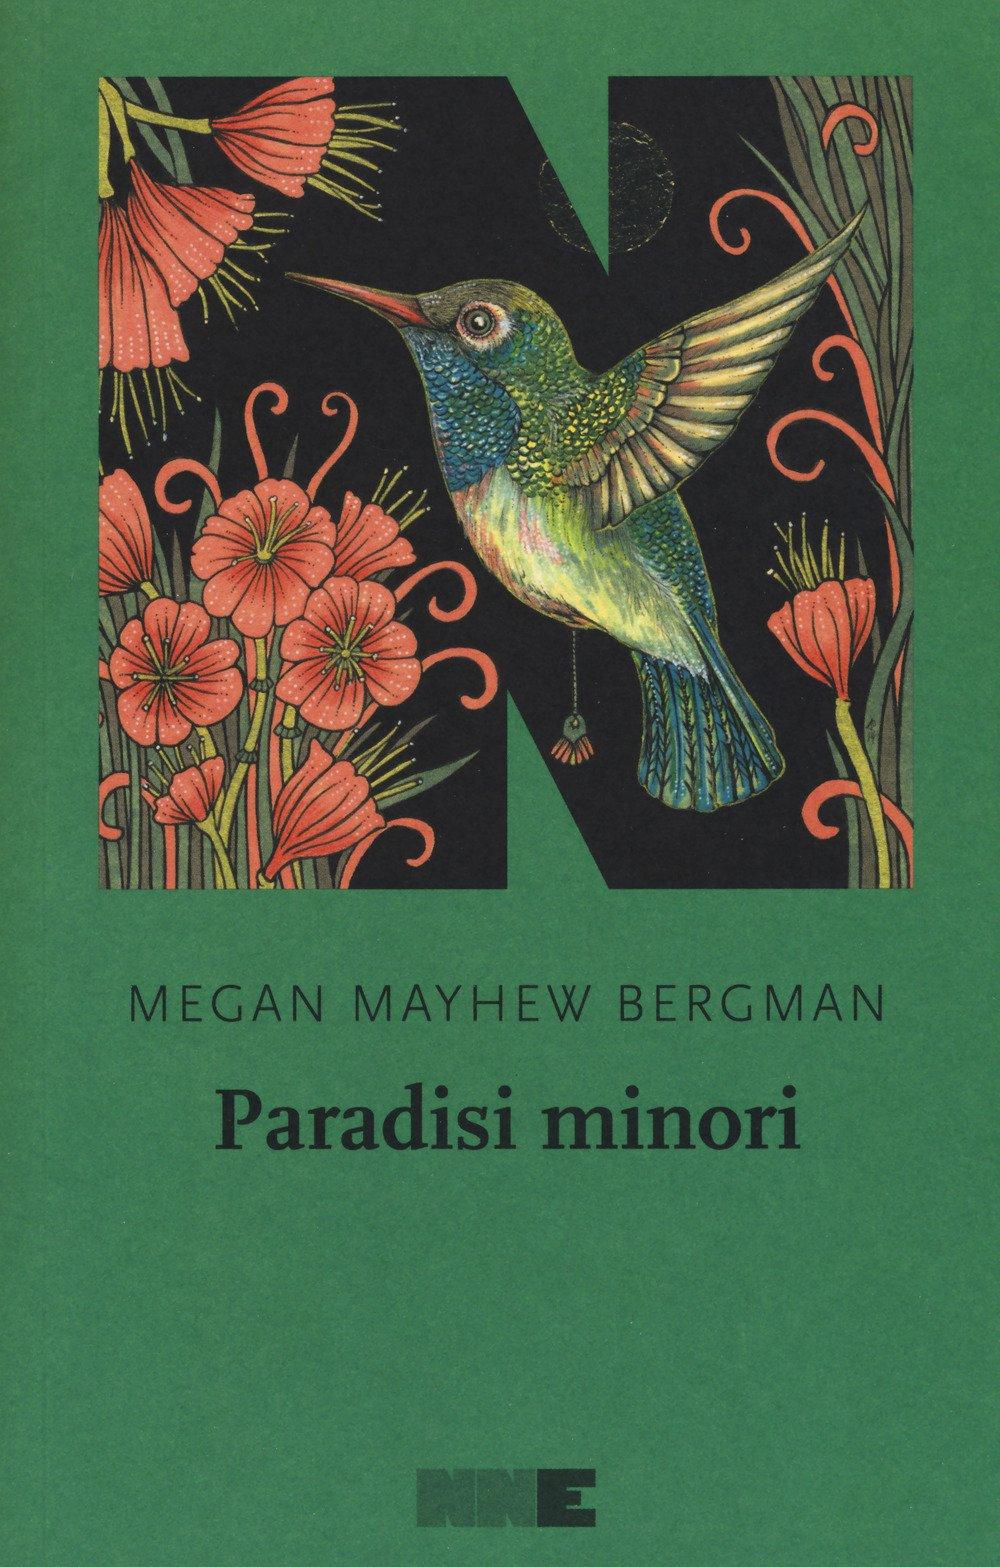 Bergman paradisi minori